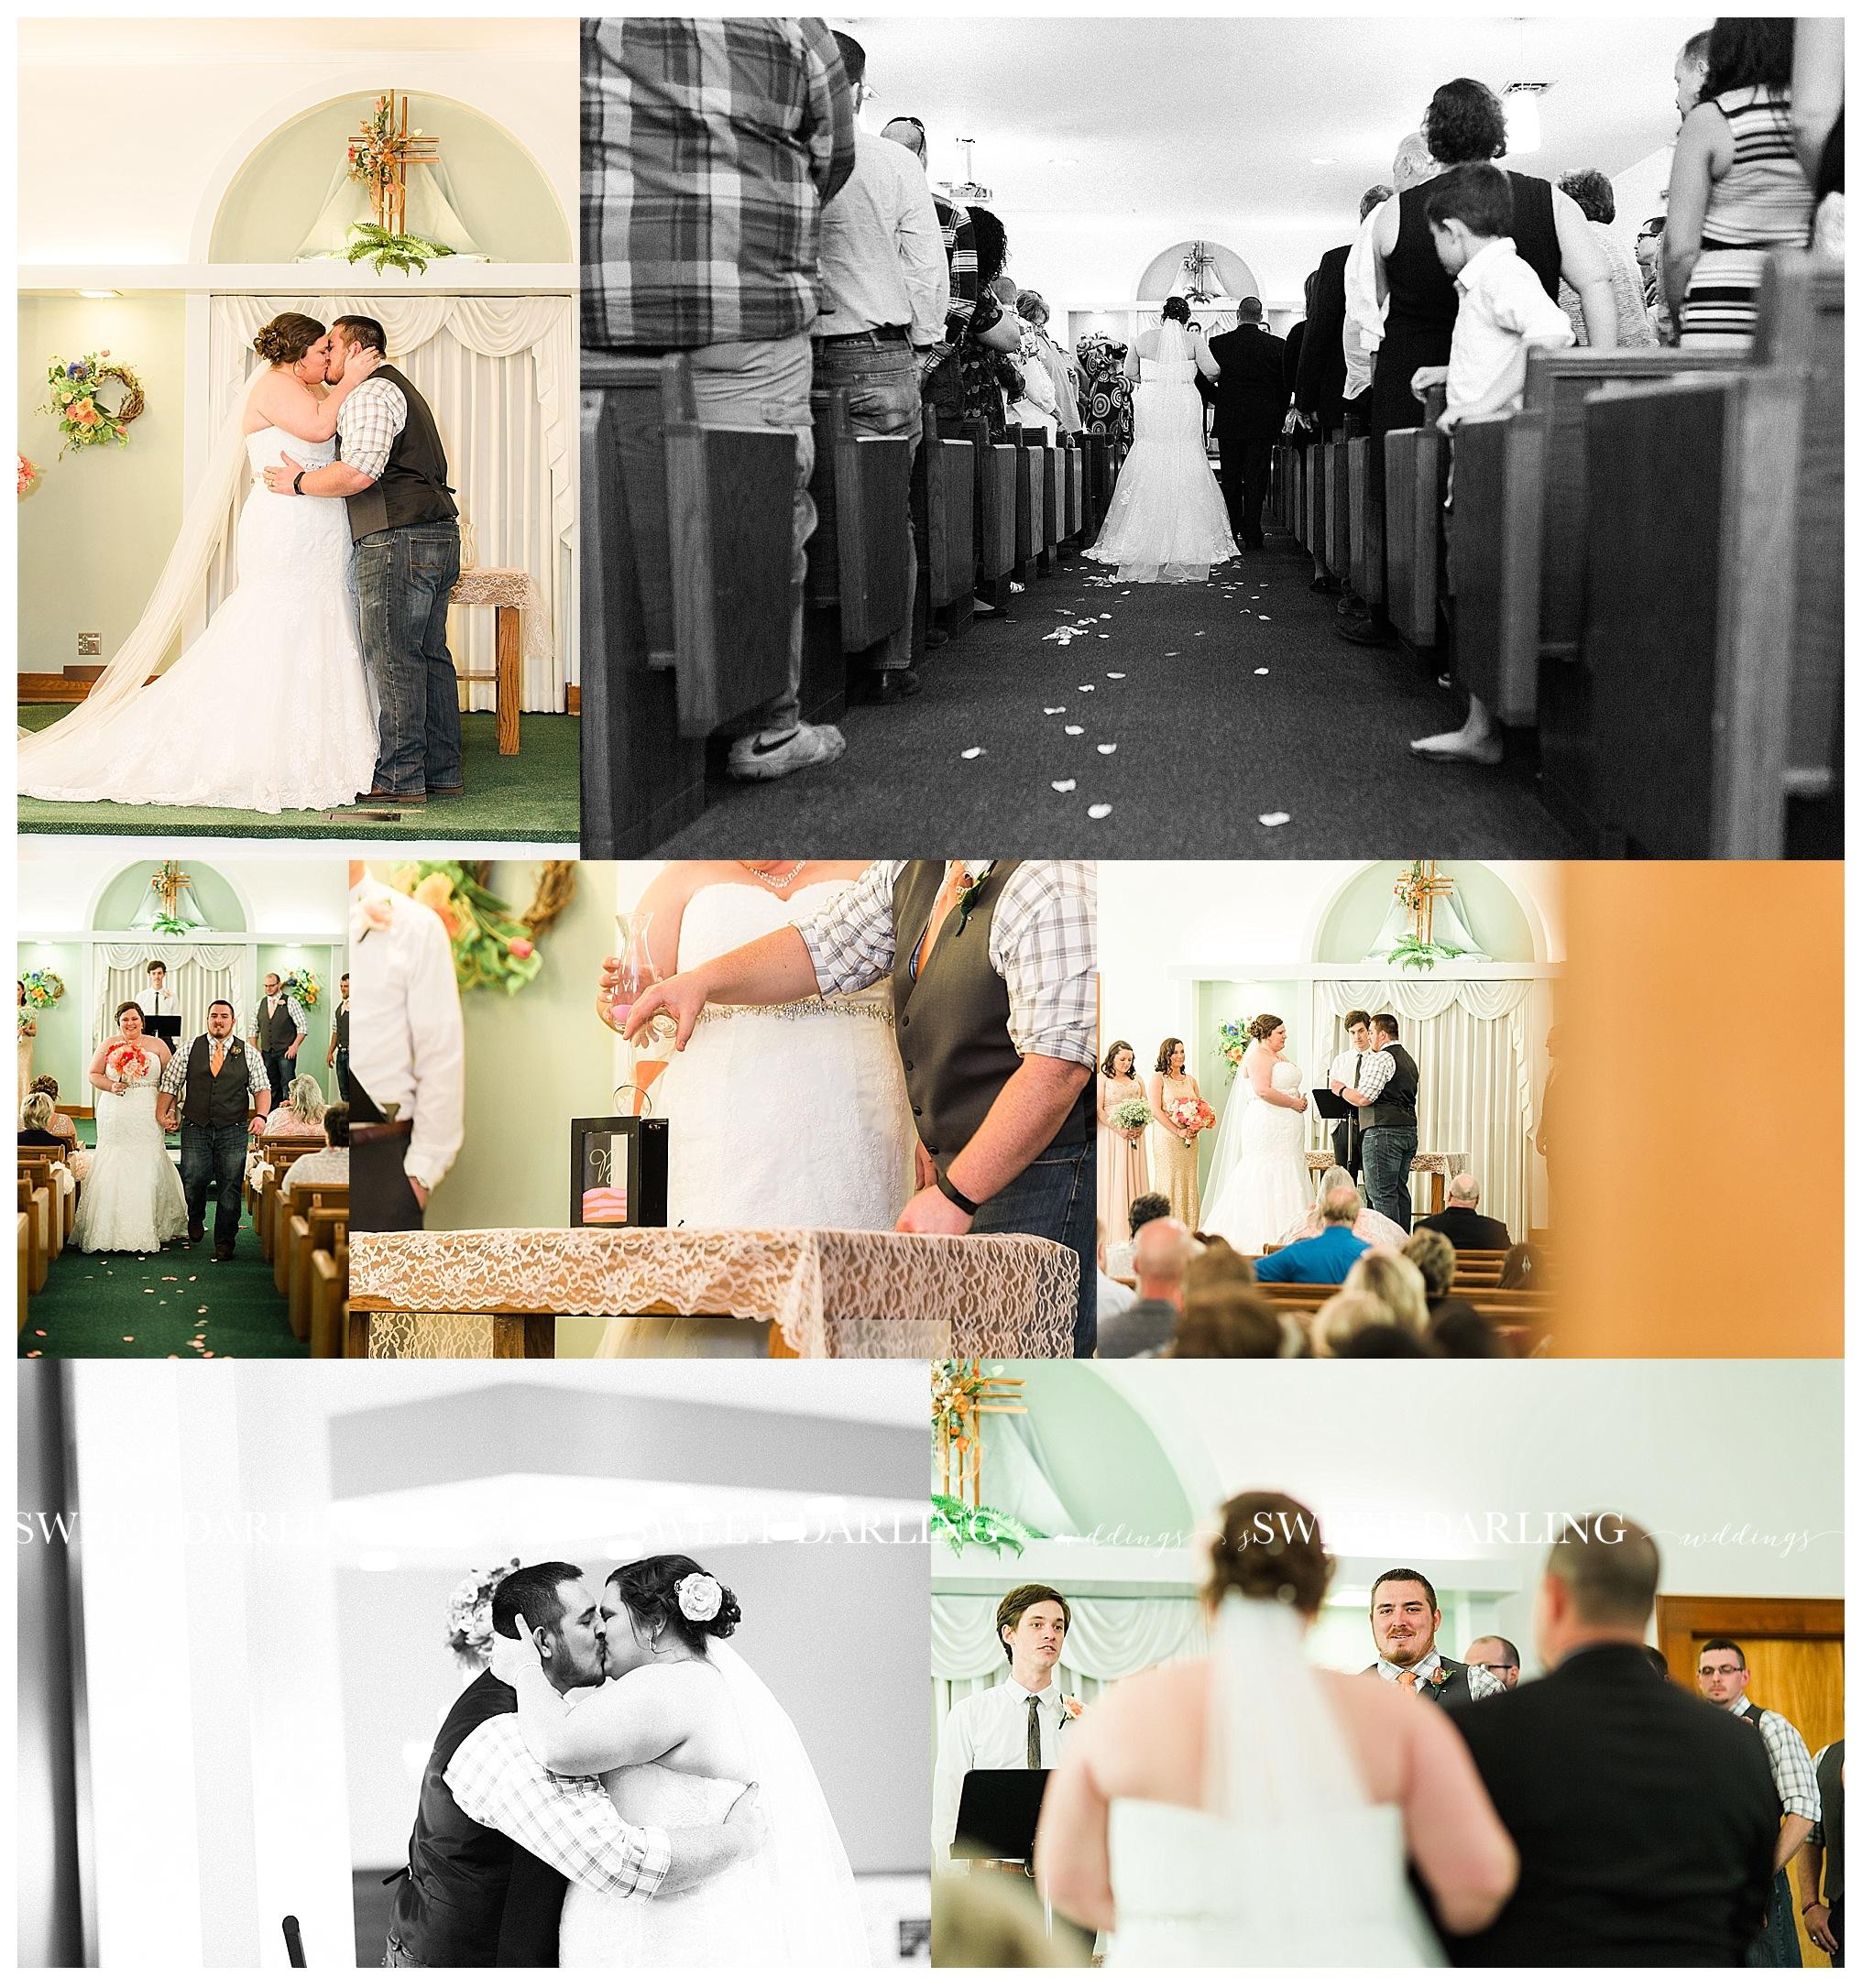 arcoloa-illinois-coles-county-wedding-photography-sweet-darling-weddings-photographer_0955.jpg